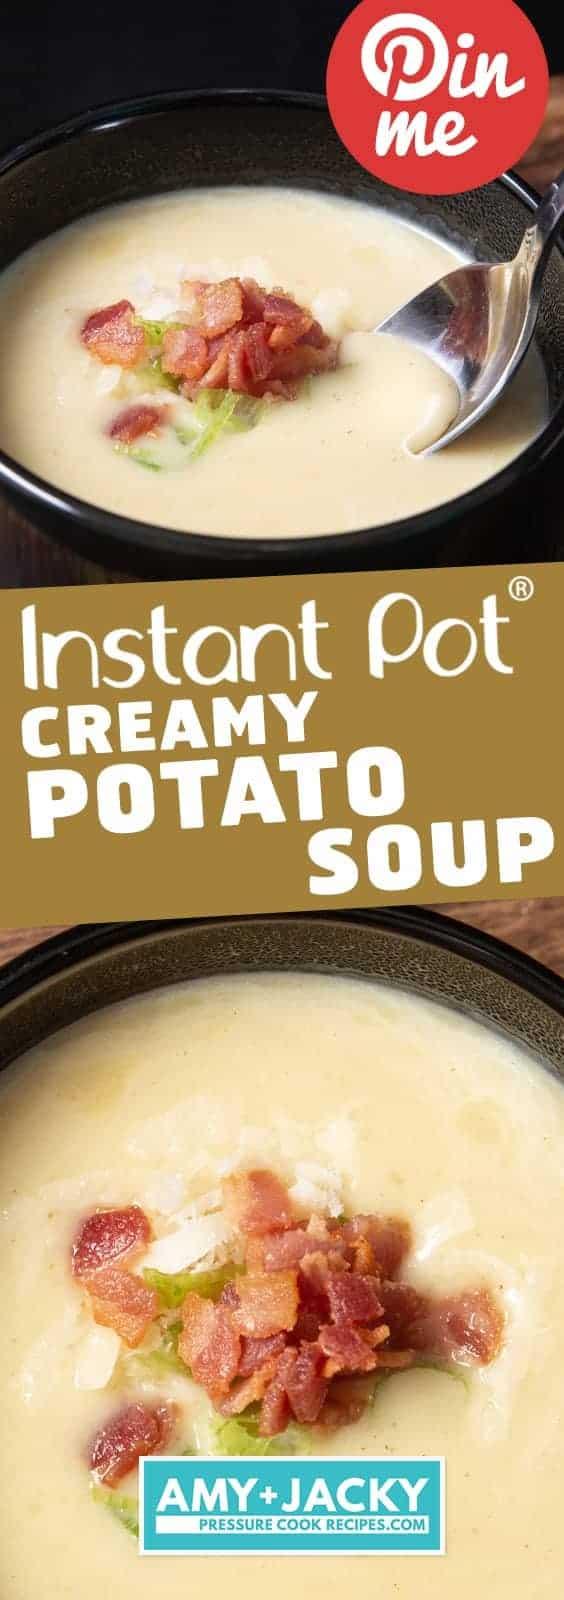 Instant Pot Potato Soup | Pressure Cooker Potato Soup | Easy Potato Soup | Loaded Potato Soup | Instant Pot Soup | Instant Pot Potatoes | Instant Pot Recipes | Pressure Cooker Recipes #instantpot #pressurecooker #soup #recipes #potatoes